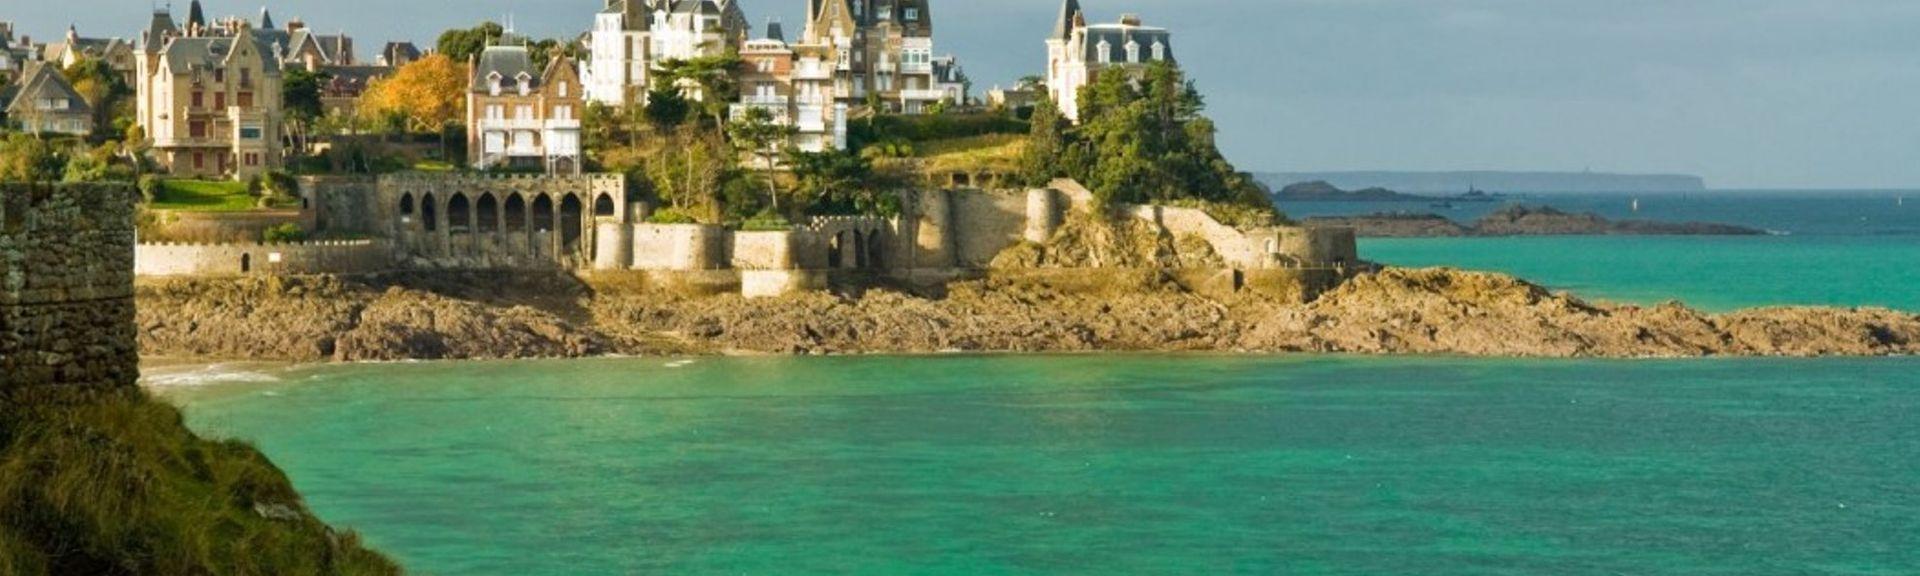 Saint-Coulomb, Bretagne, France